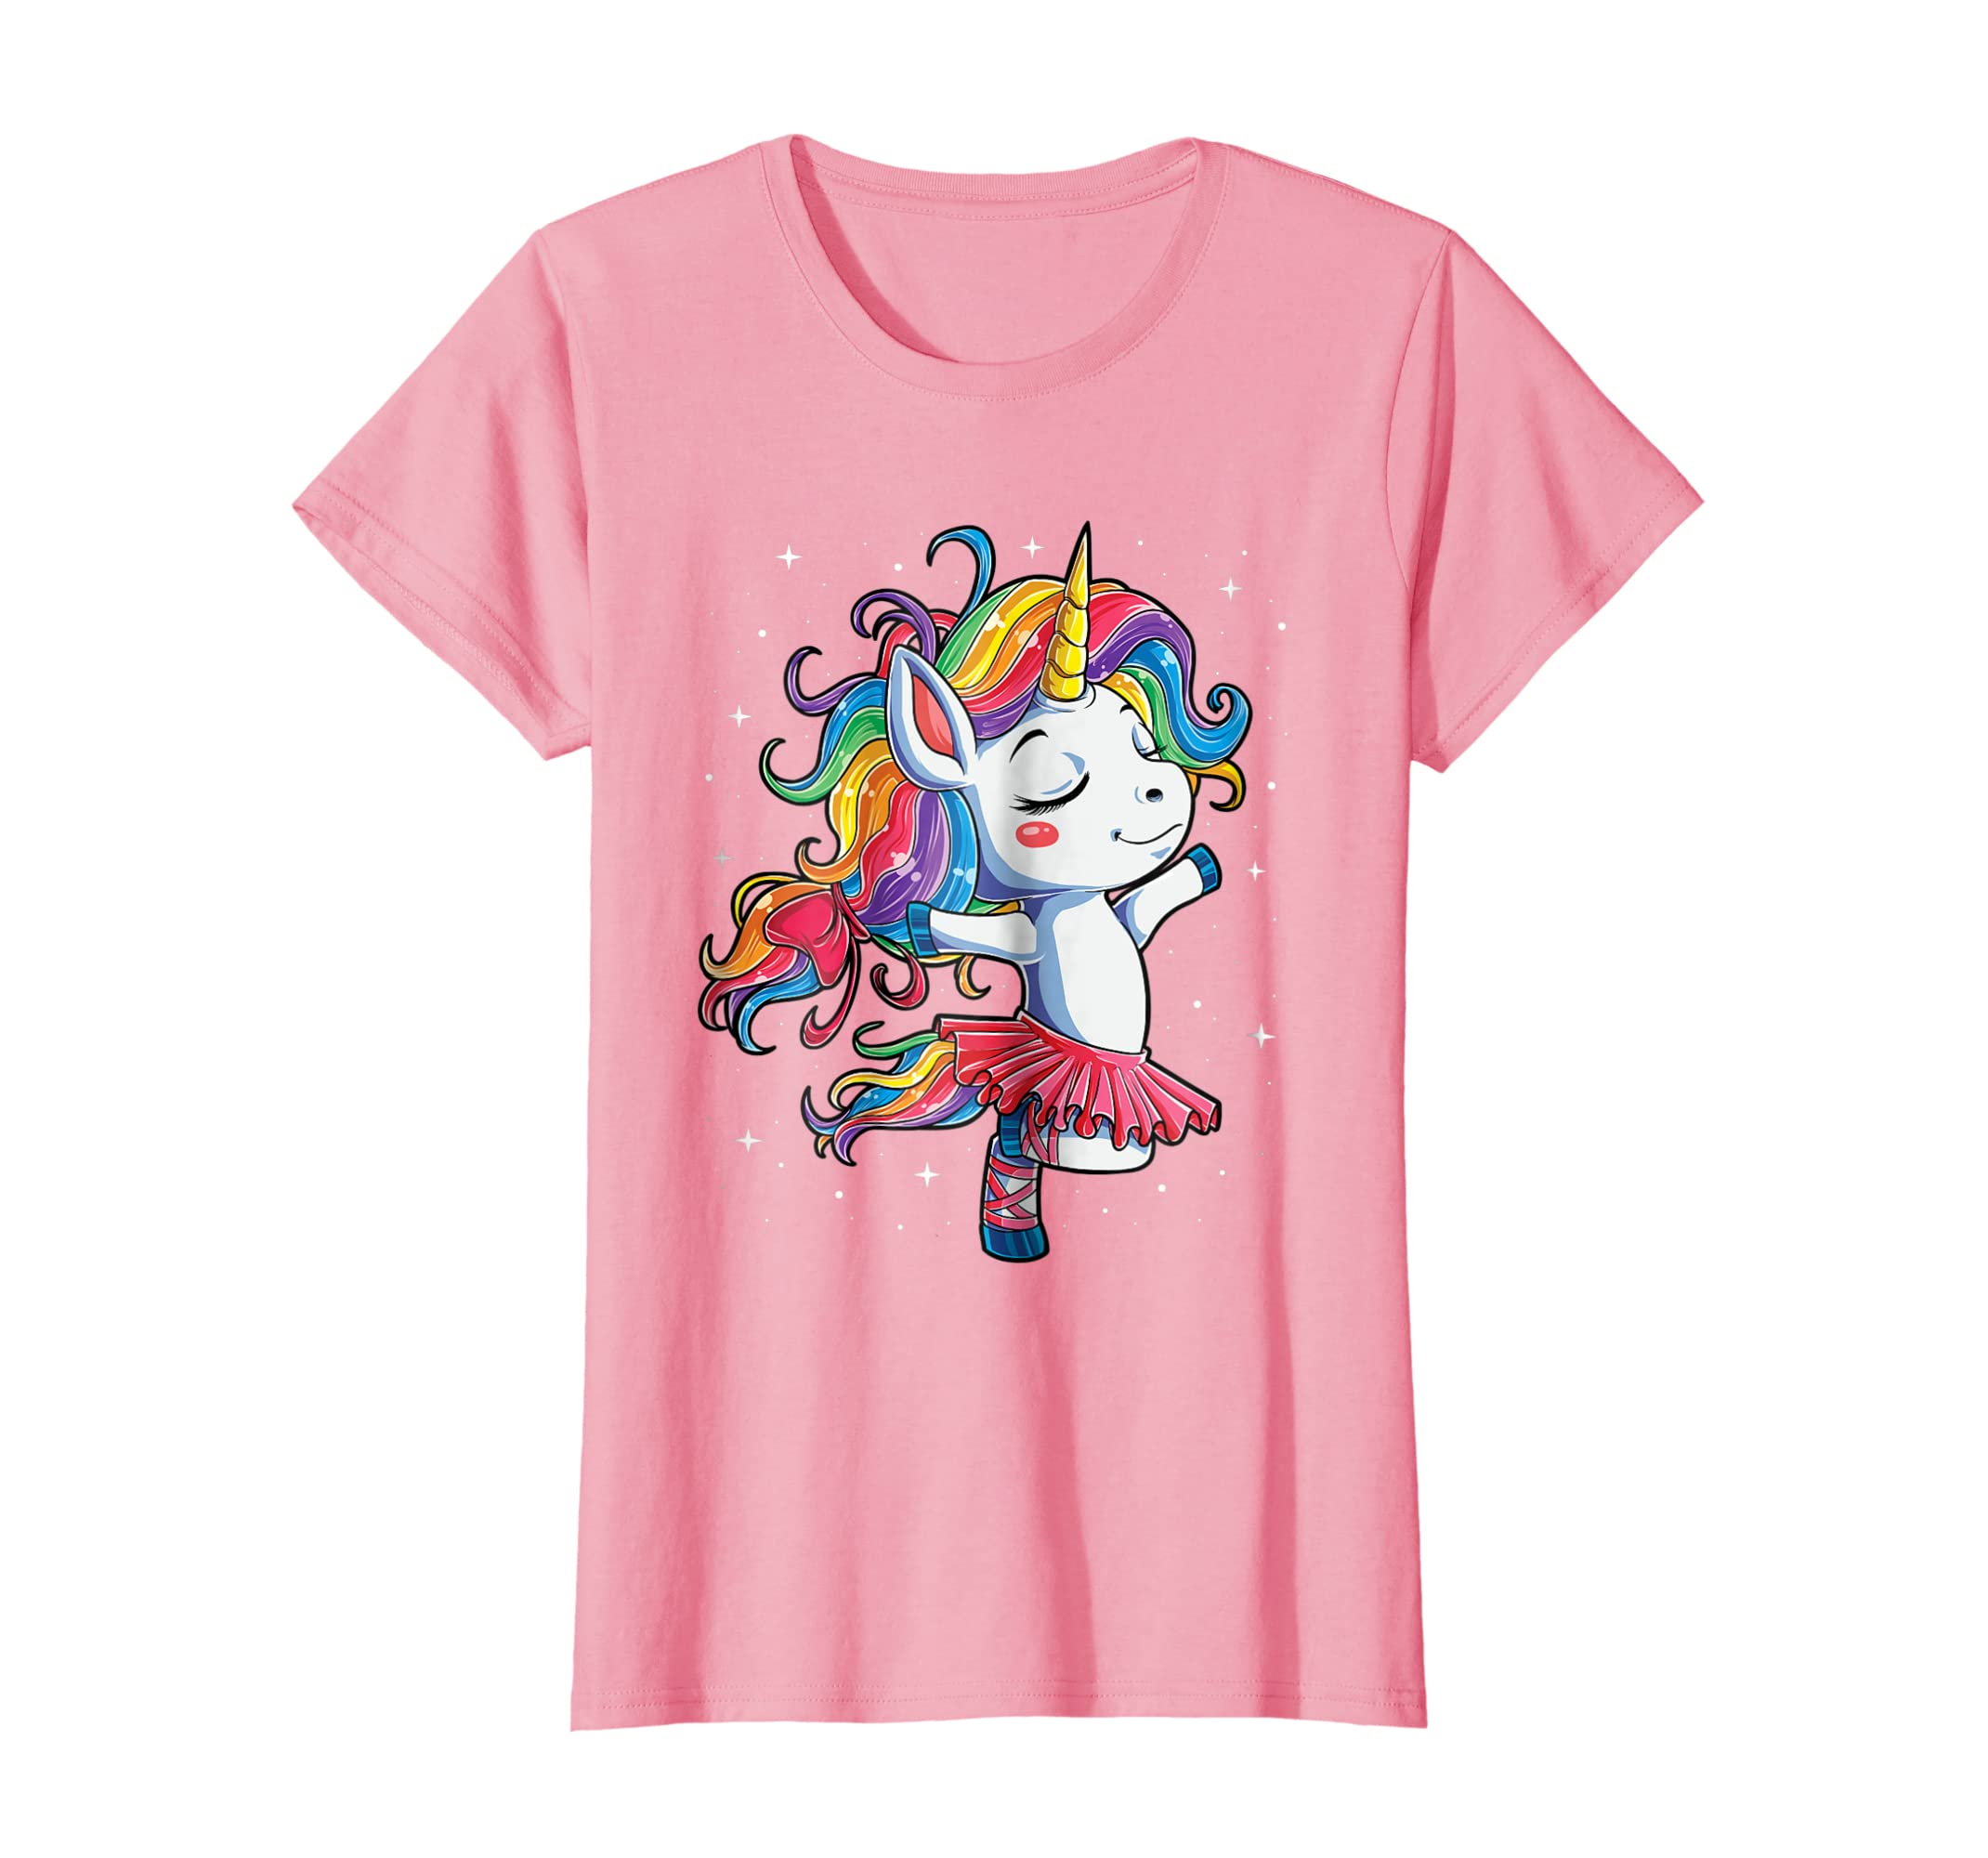 Ballet Dancer Unicorn T shirt Kids Girls Rainbow Ballerina-Teesml